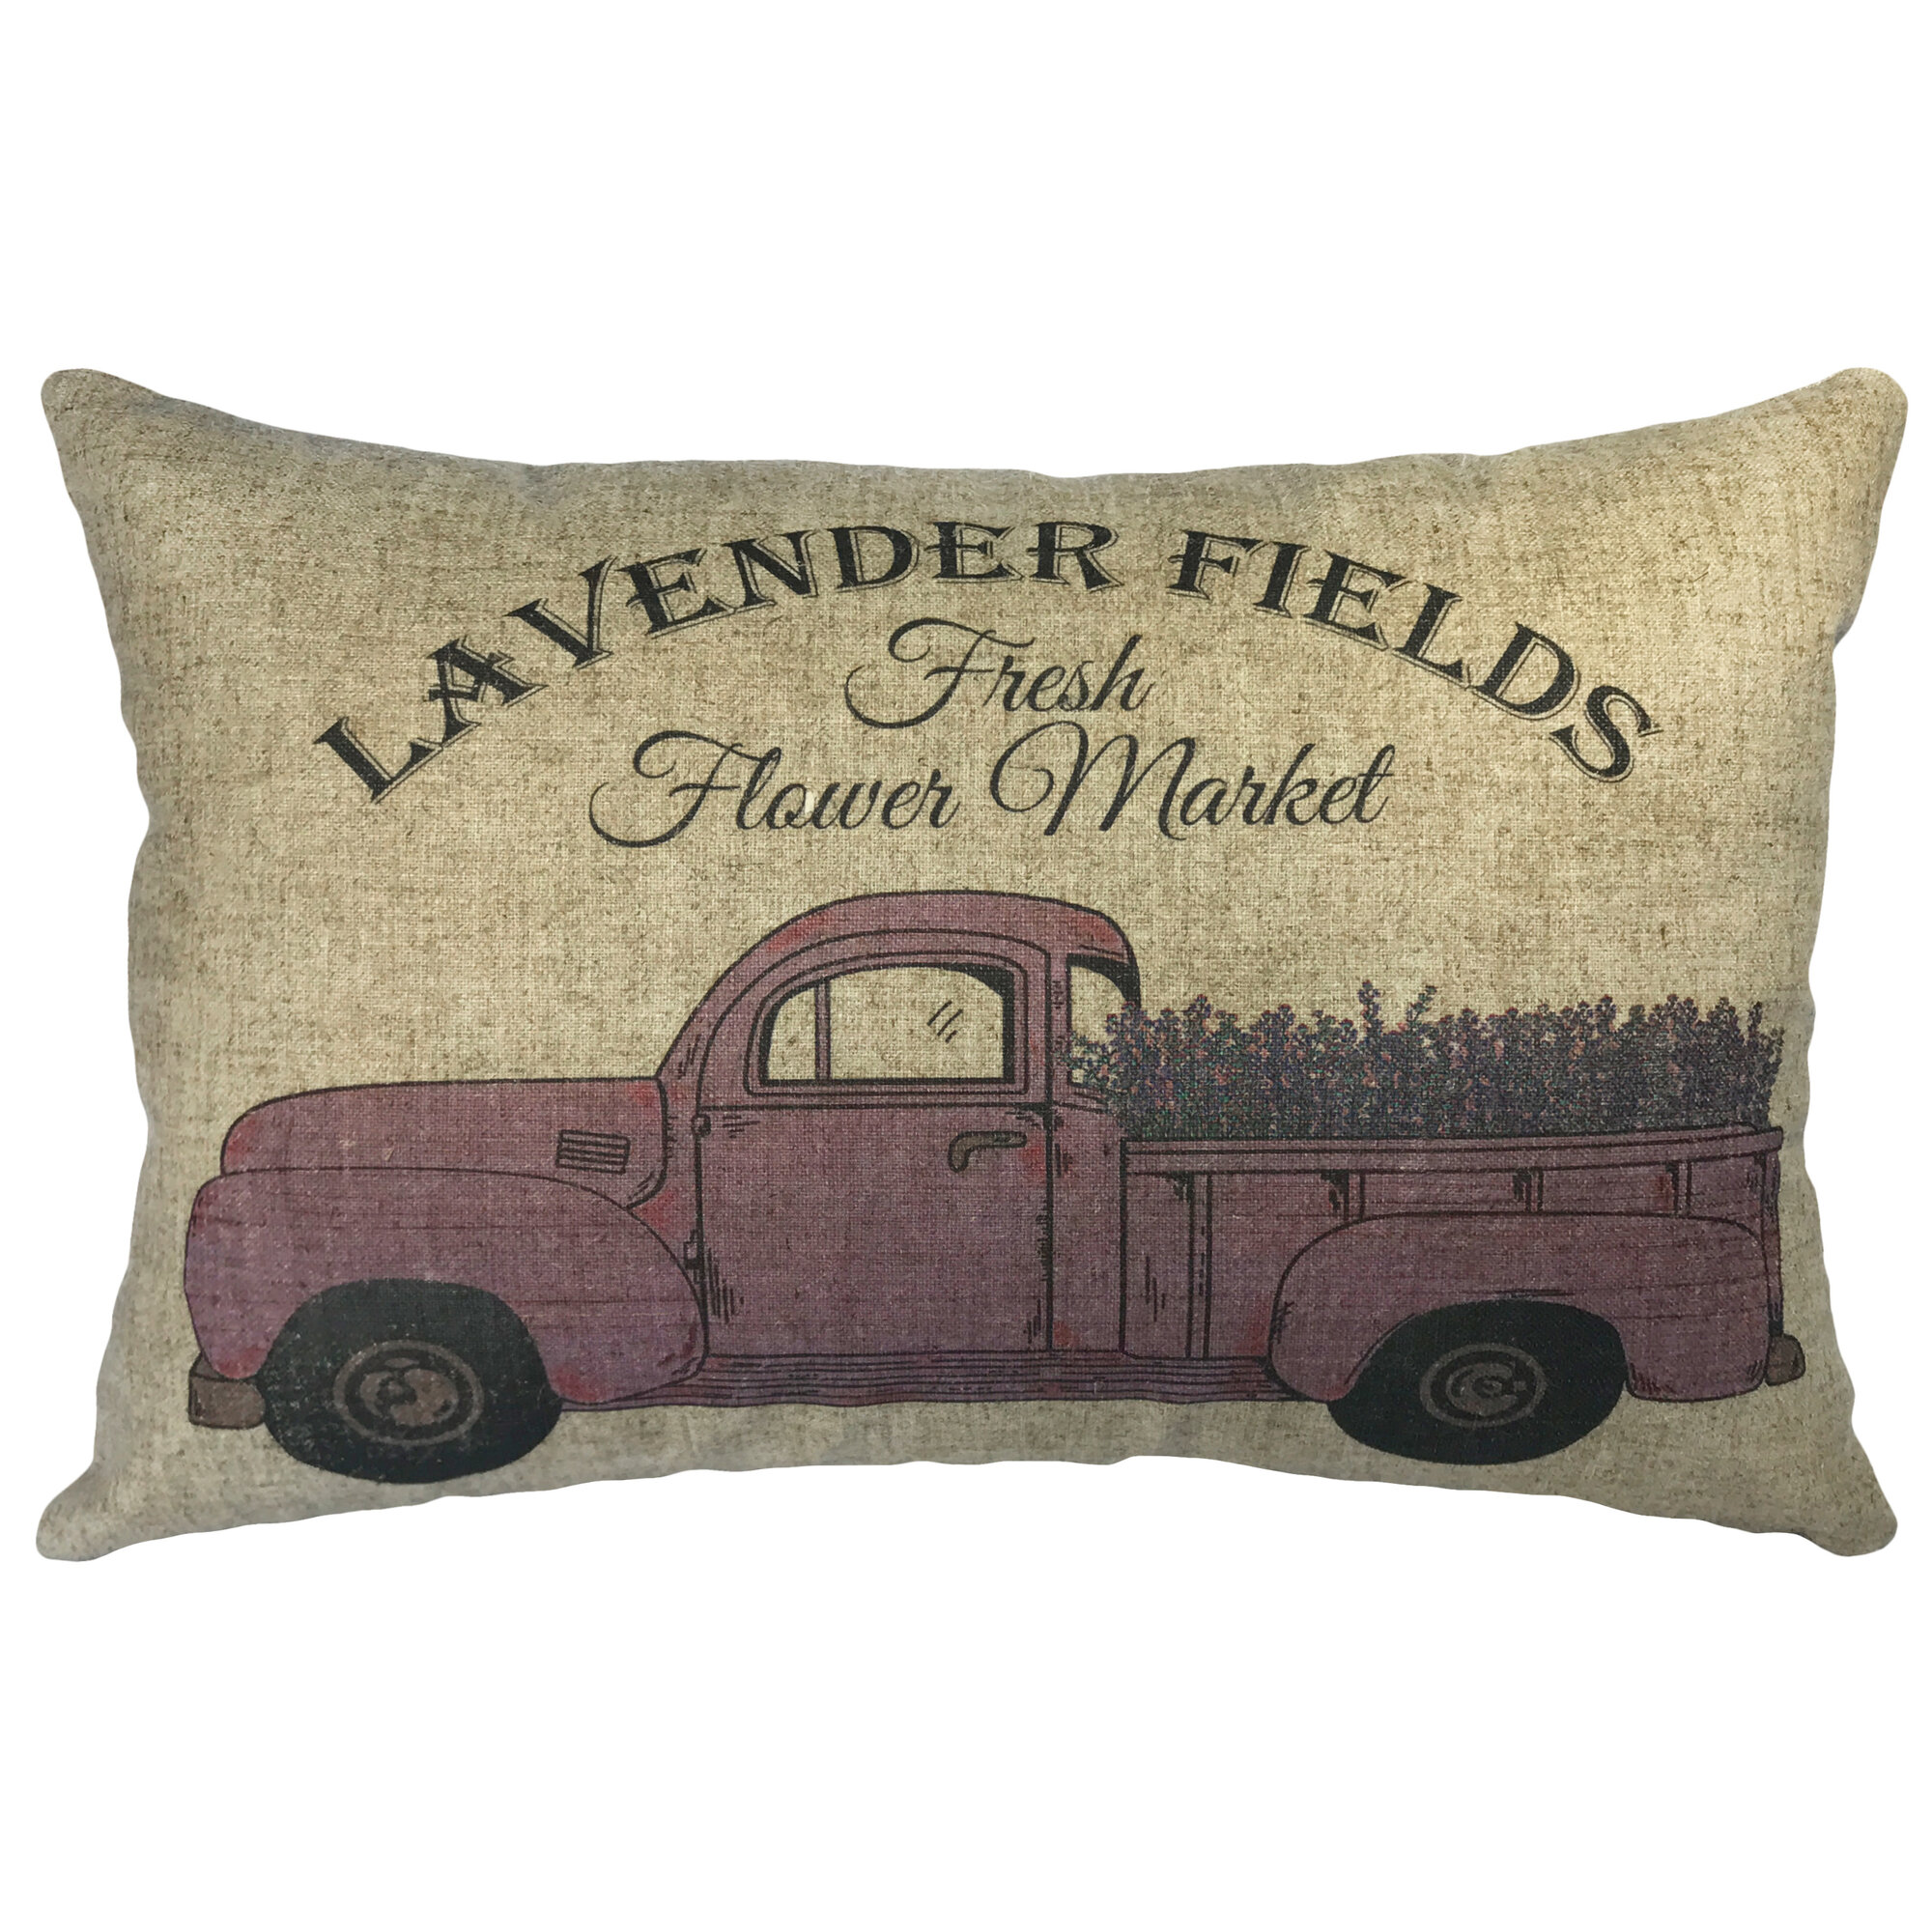 Details About August Grove Candelario Lavender Fields Linen Lumbar Pillow